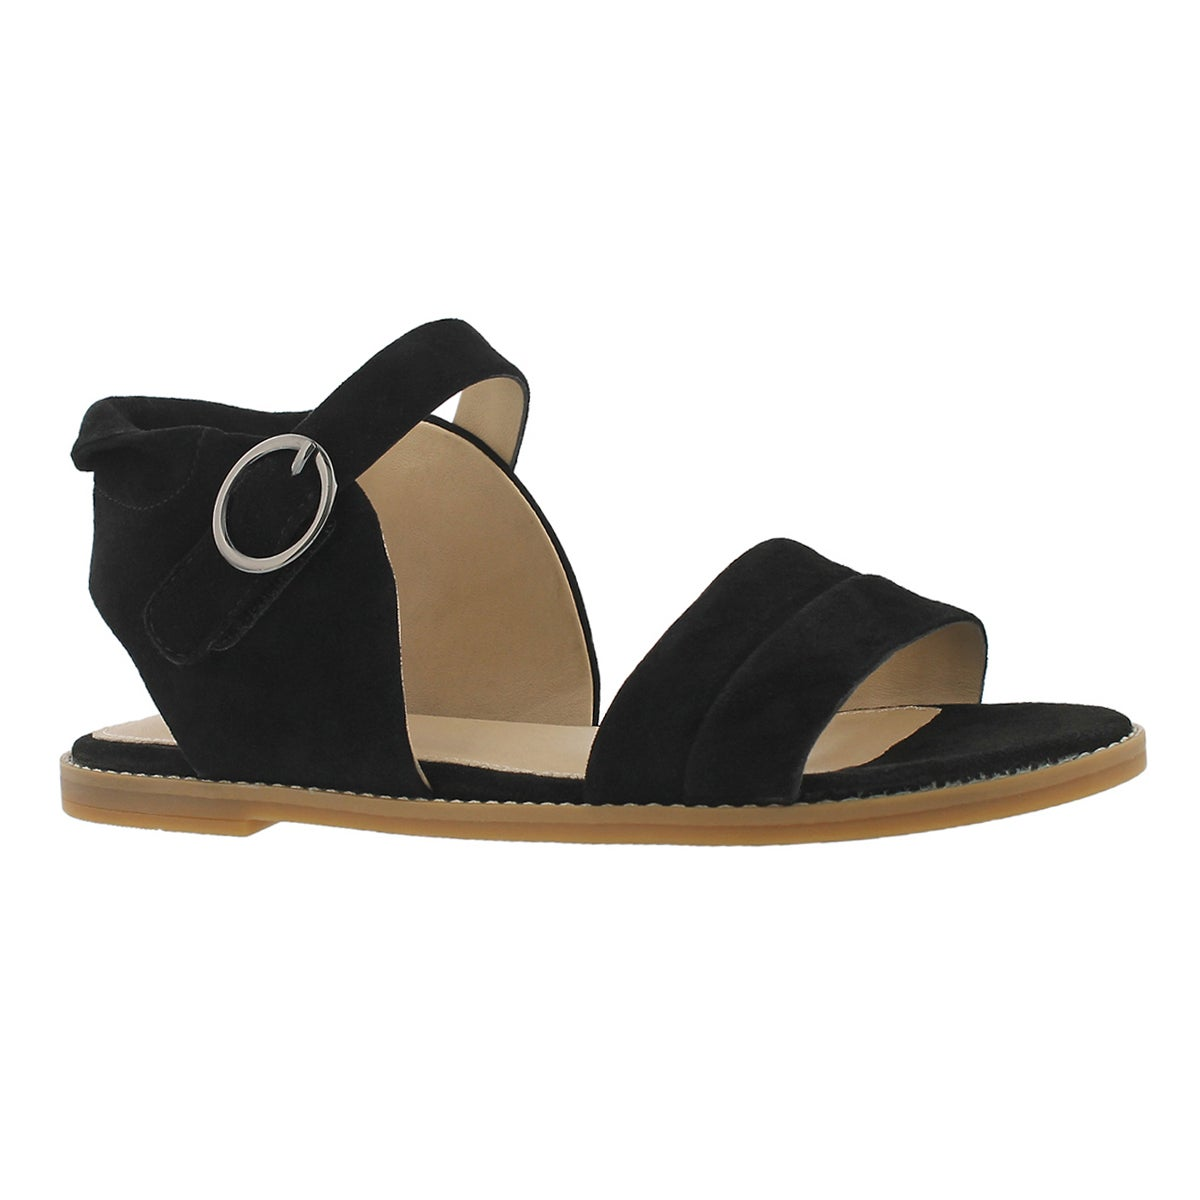 Women's ABIA CHRISSIE black casual sandals